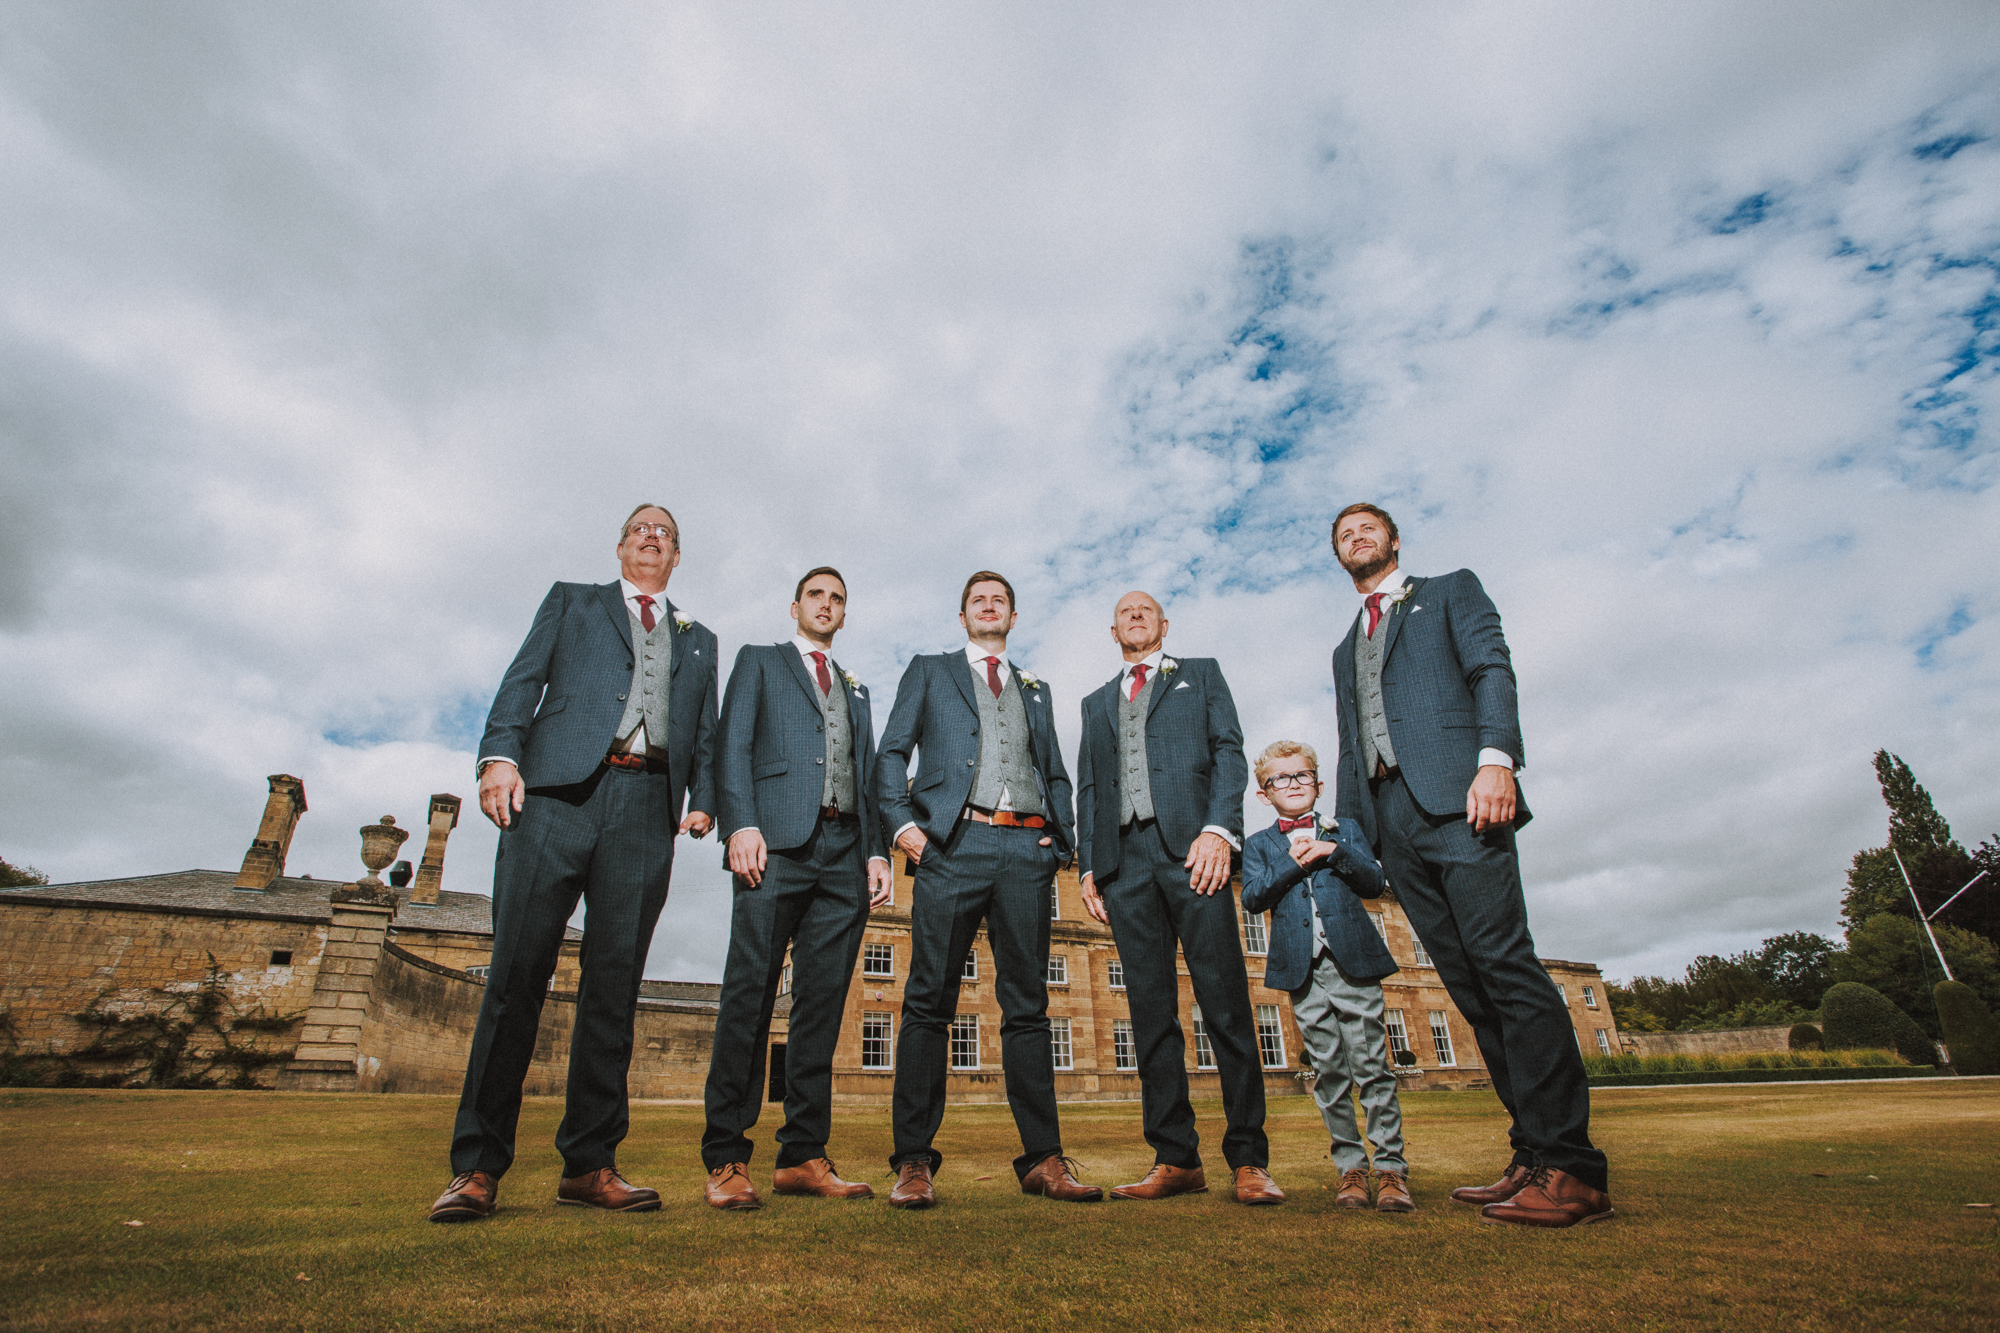 bowcliffe hall wedding photographers yorkshire-17.jpg